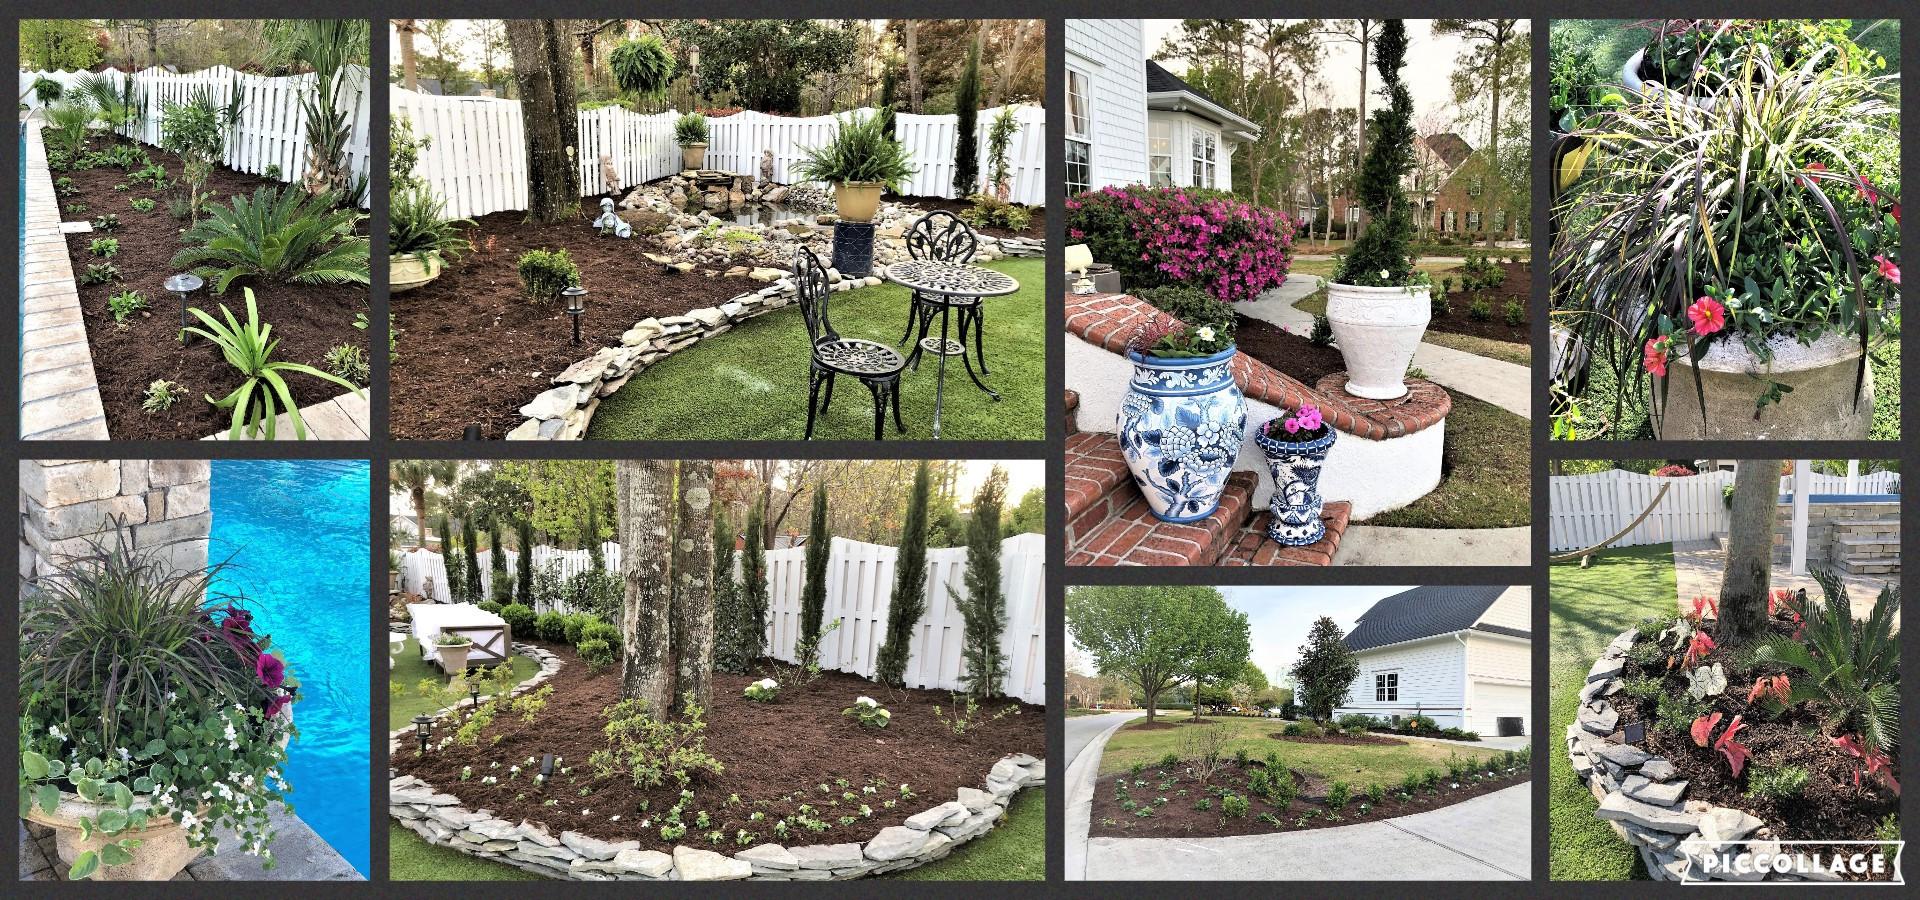 A gorgeous home deserves a gorgeous yard!